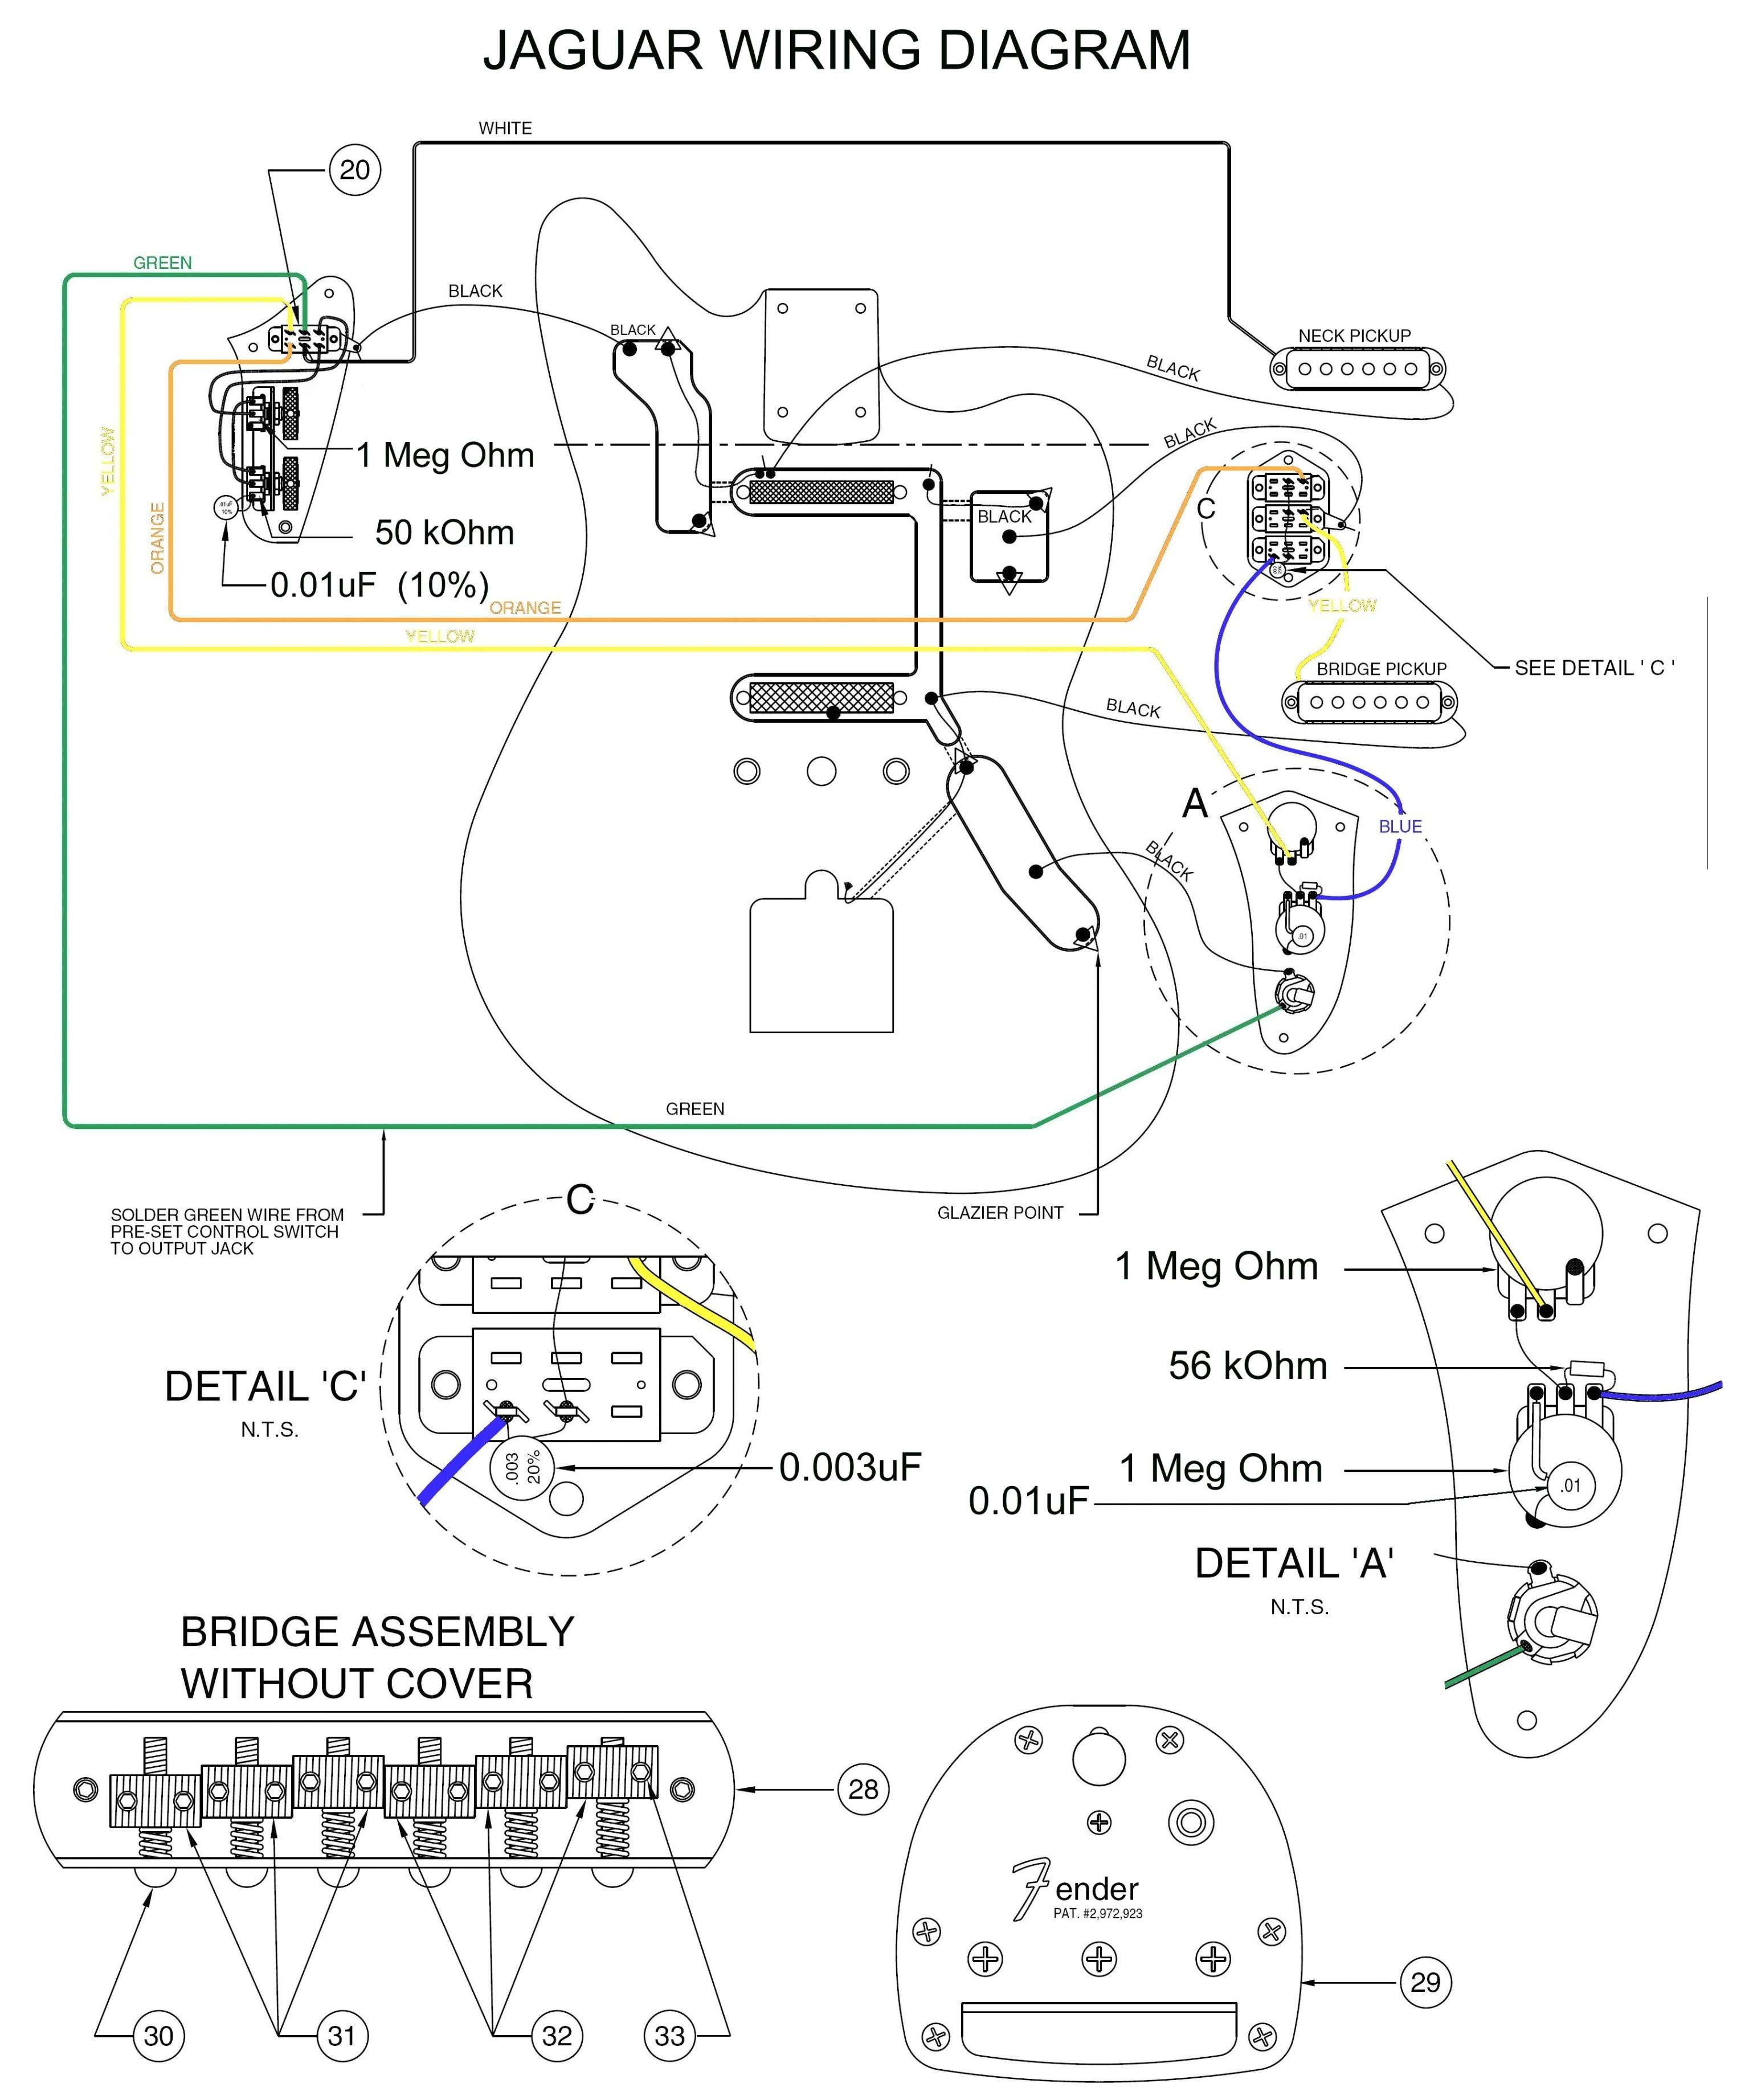 gibson varitone wiring diagram new bc rich varitone filter diagram plete wiring diagrams